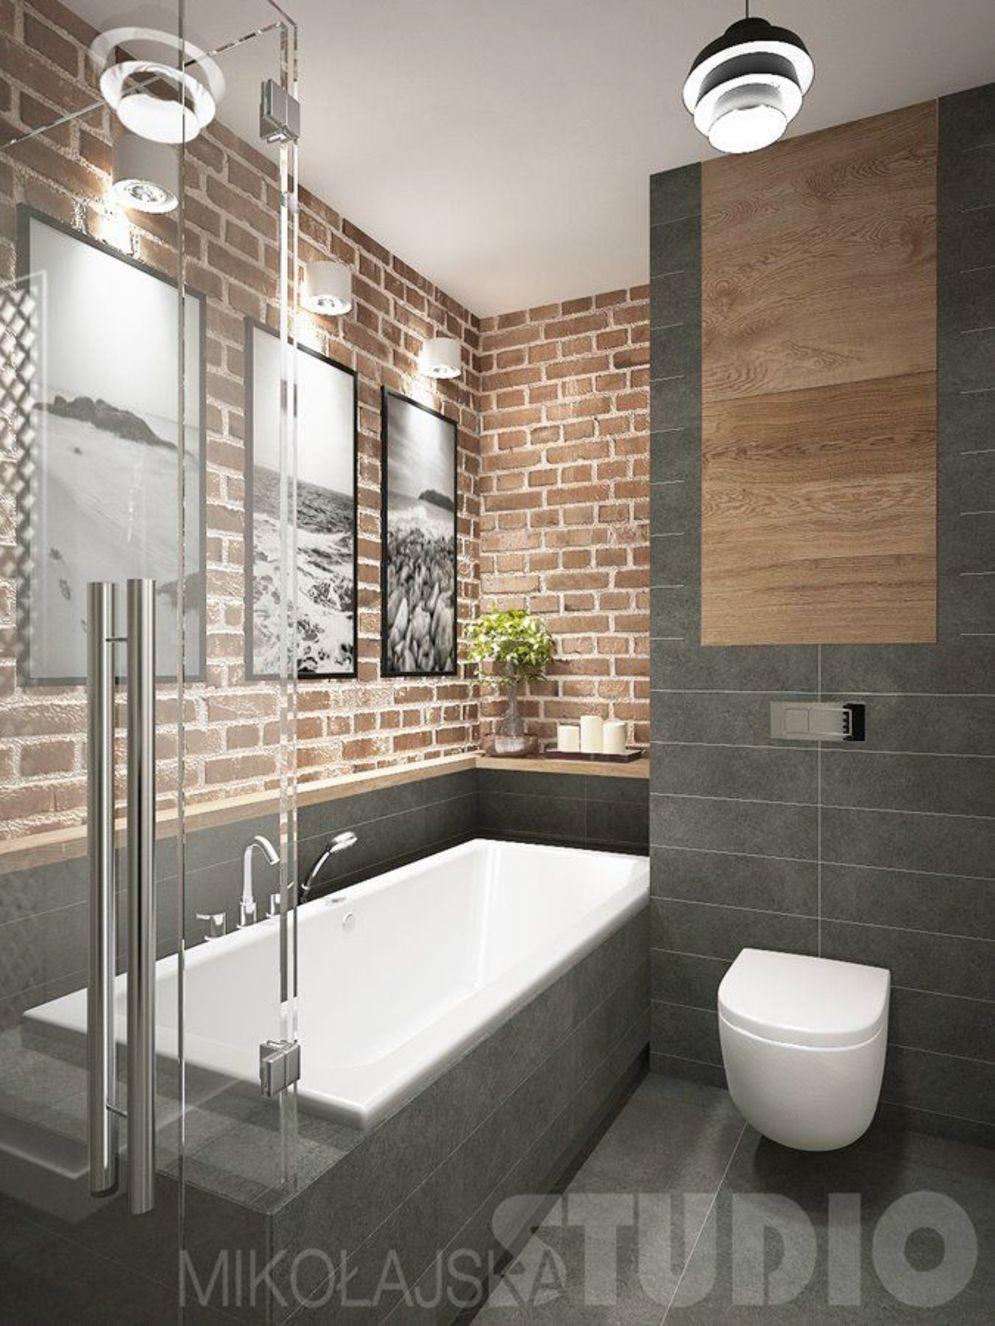 Stylish Exposed Brick Bathroom Ideas You Must See Modern Rustic Bathroom Styles Showing Amazing Vi Brick Bathroom Brick Bathroom Ideas Exposed Brick Bathroom